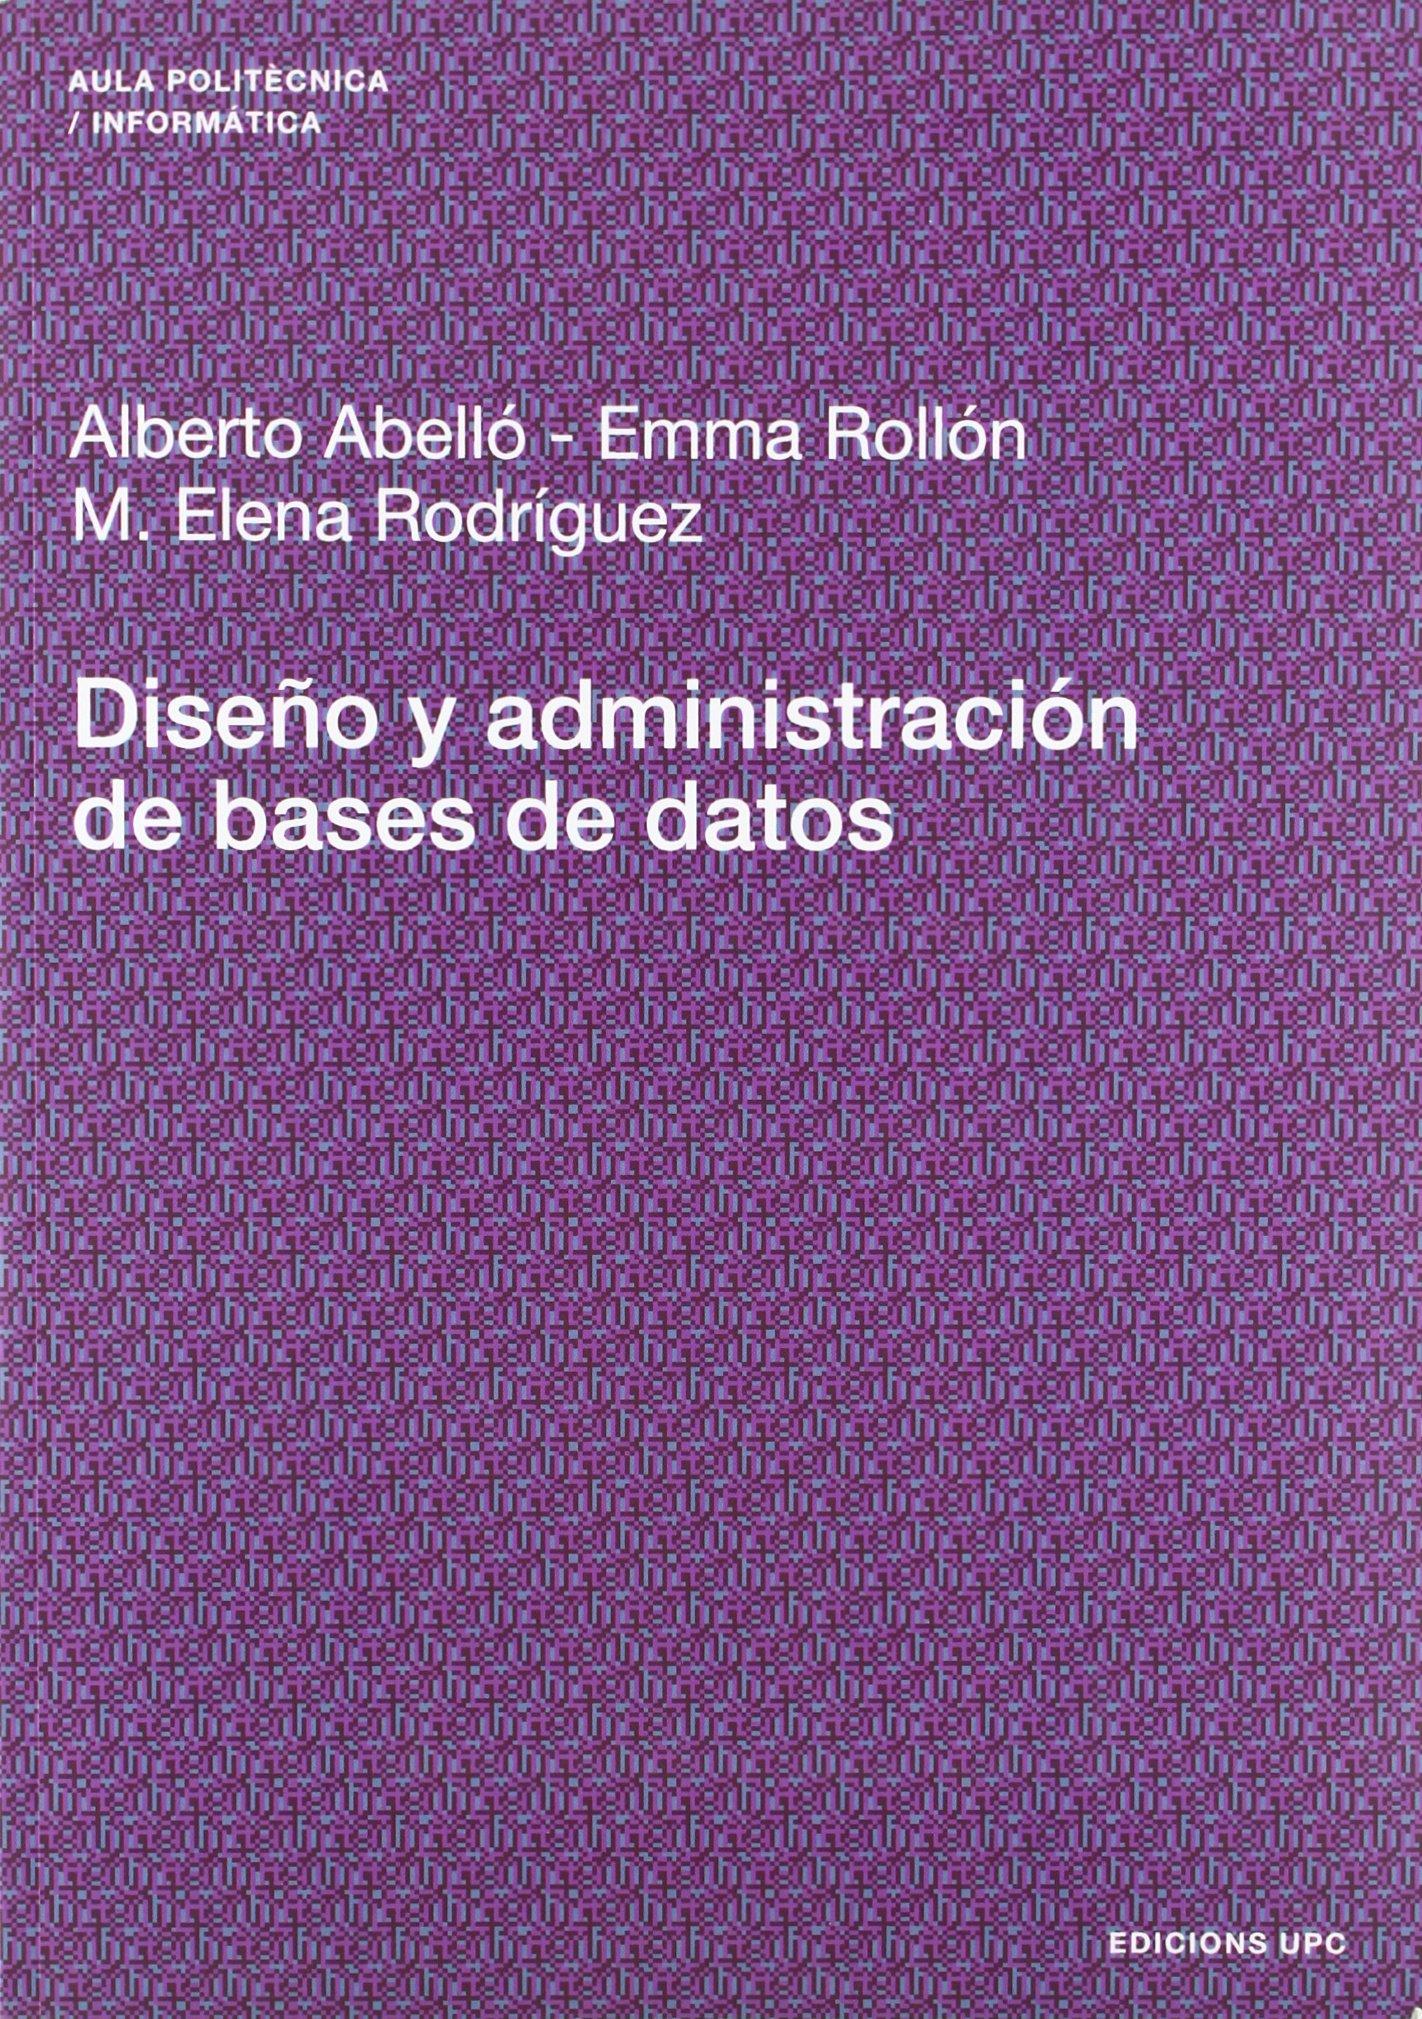 Diseño y administración de bases de datos (Aula Politècnica) Tapa blanda – 3 nov 2006 Albert Abelló Gamazo Emma Rollón Rico 8483018608 Computing: General